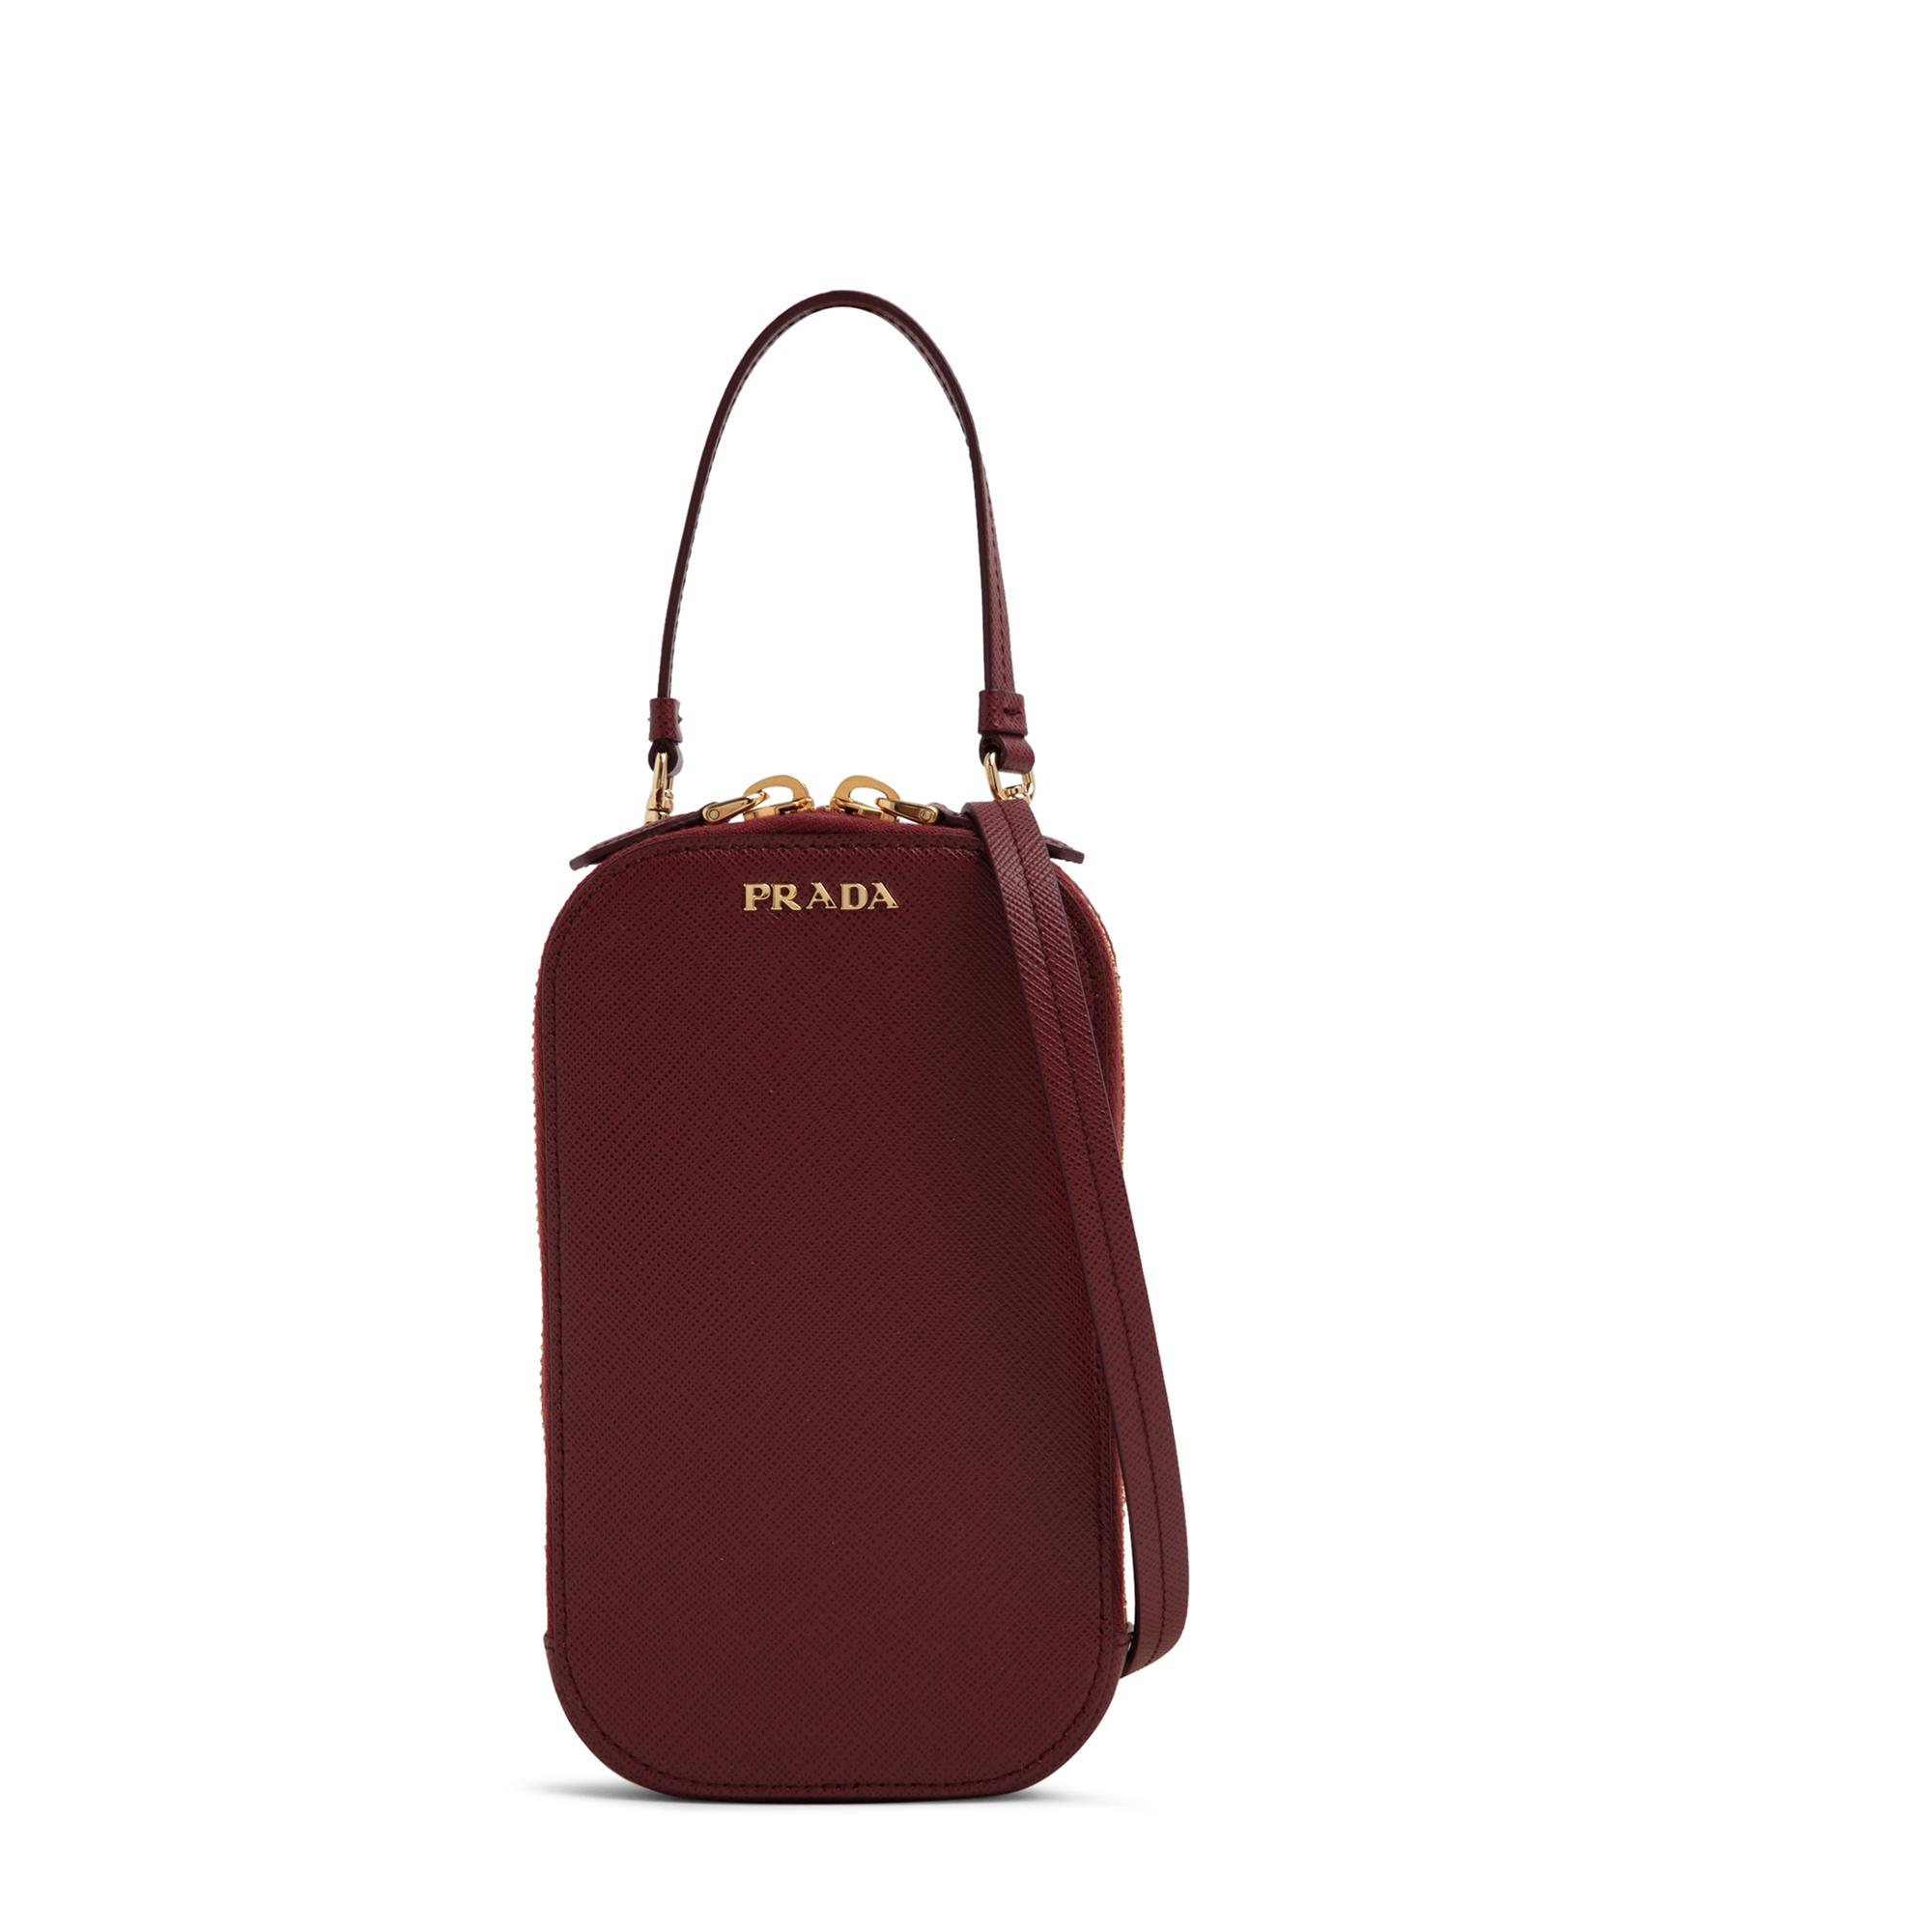 حقيبة سافيانو بحجم صغير